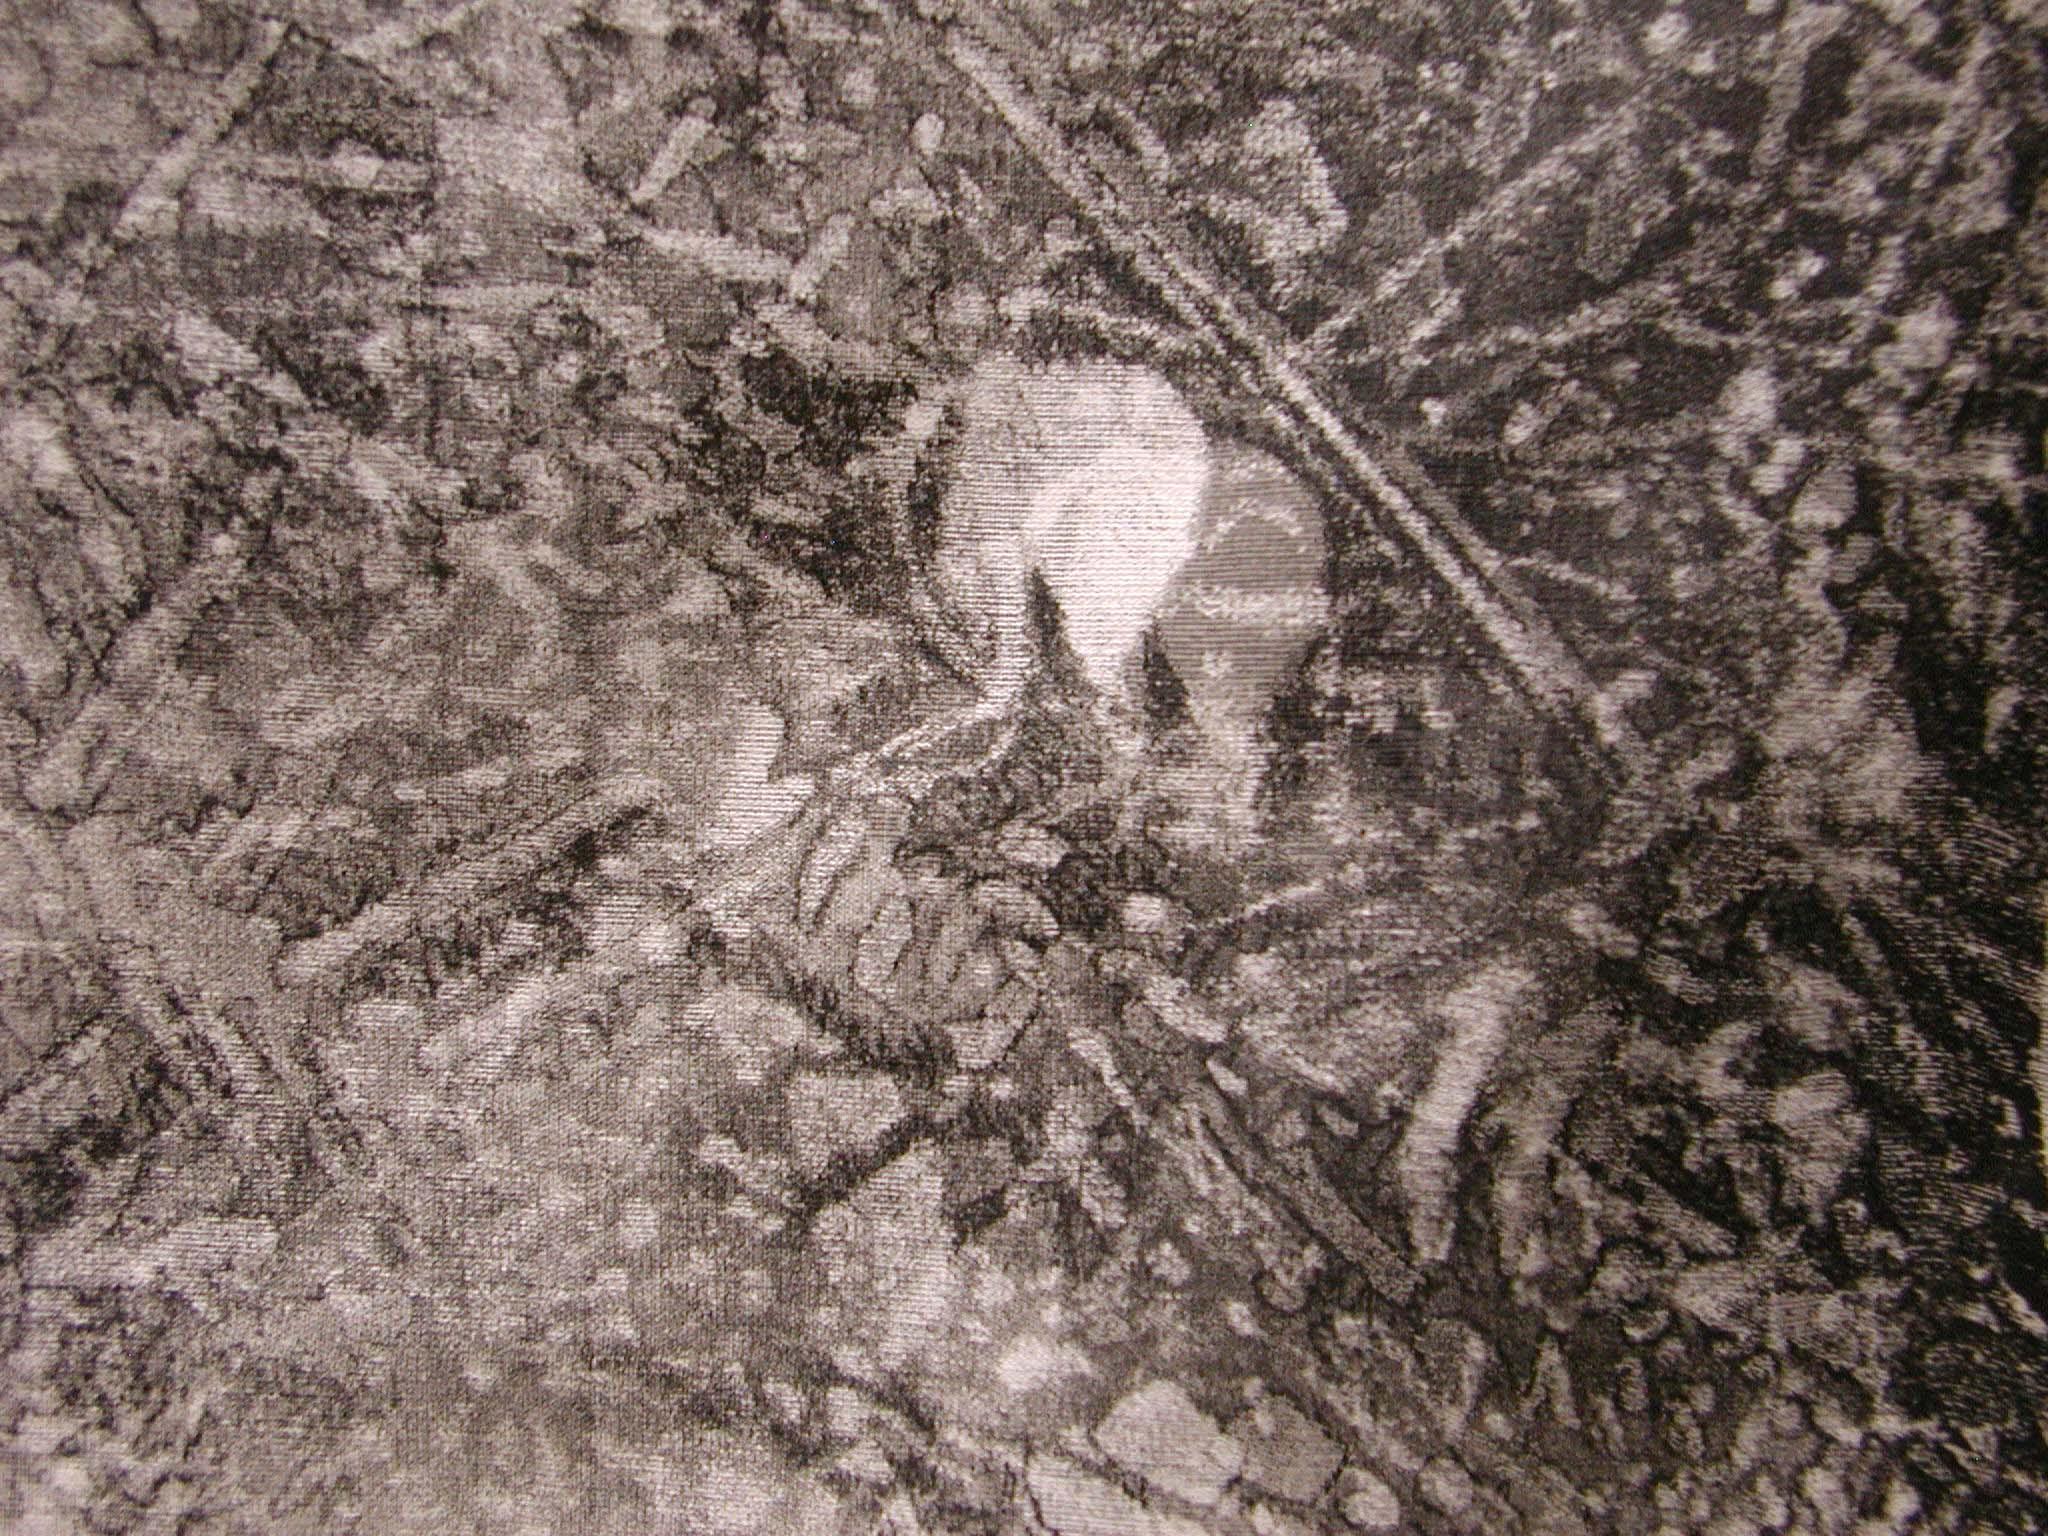 rohini-devasher-copyright-thicket-2004 (detail 2)